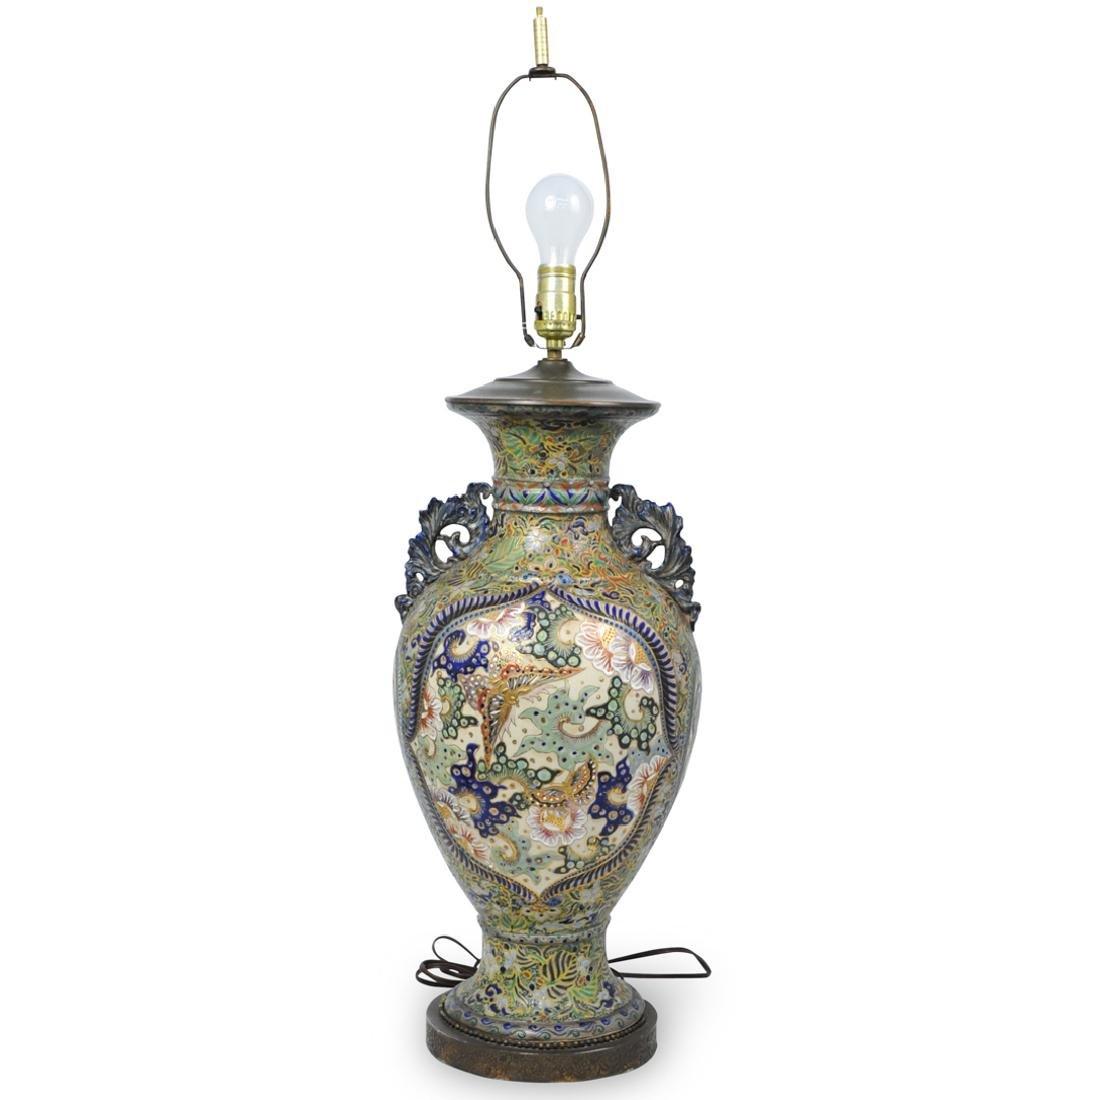 Japanese Satsuma Pottery Lamp